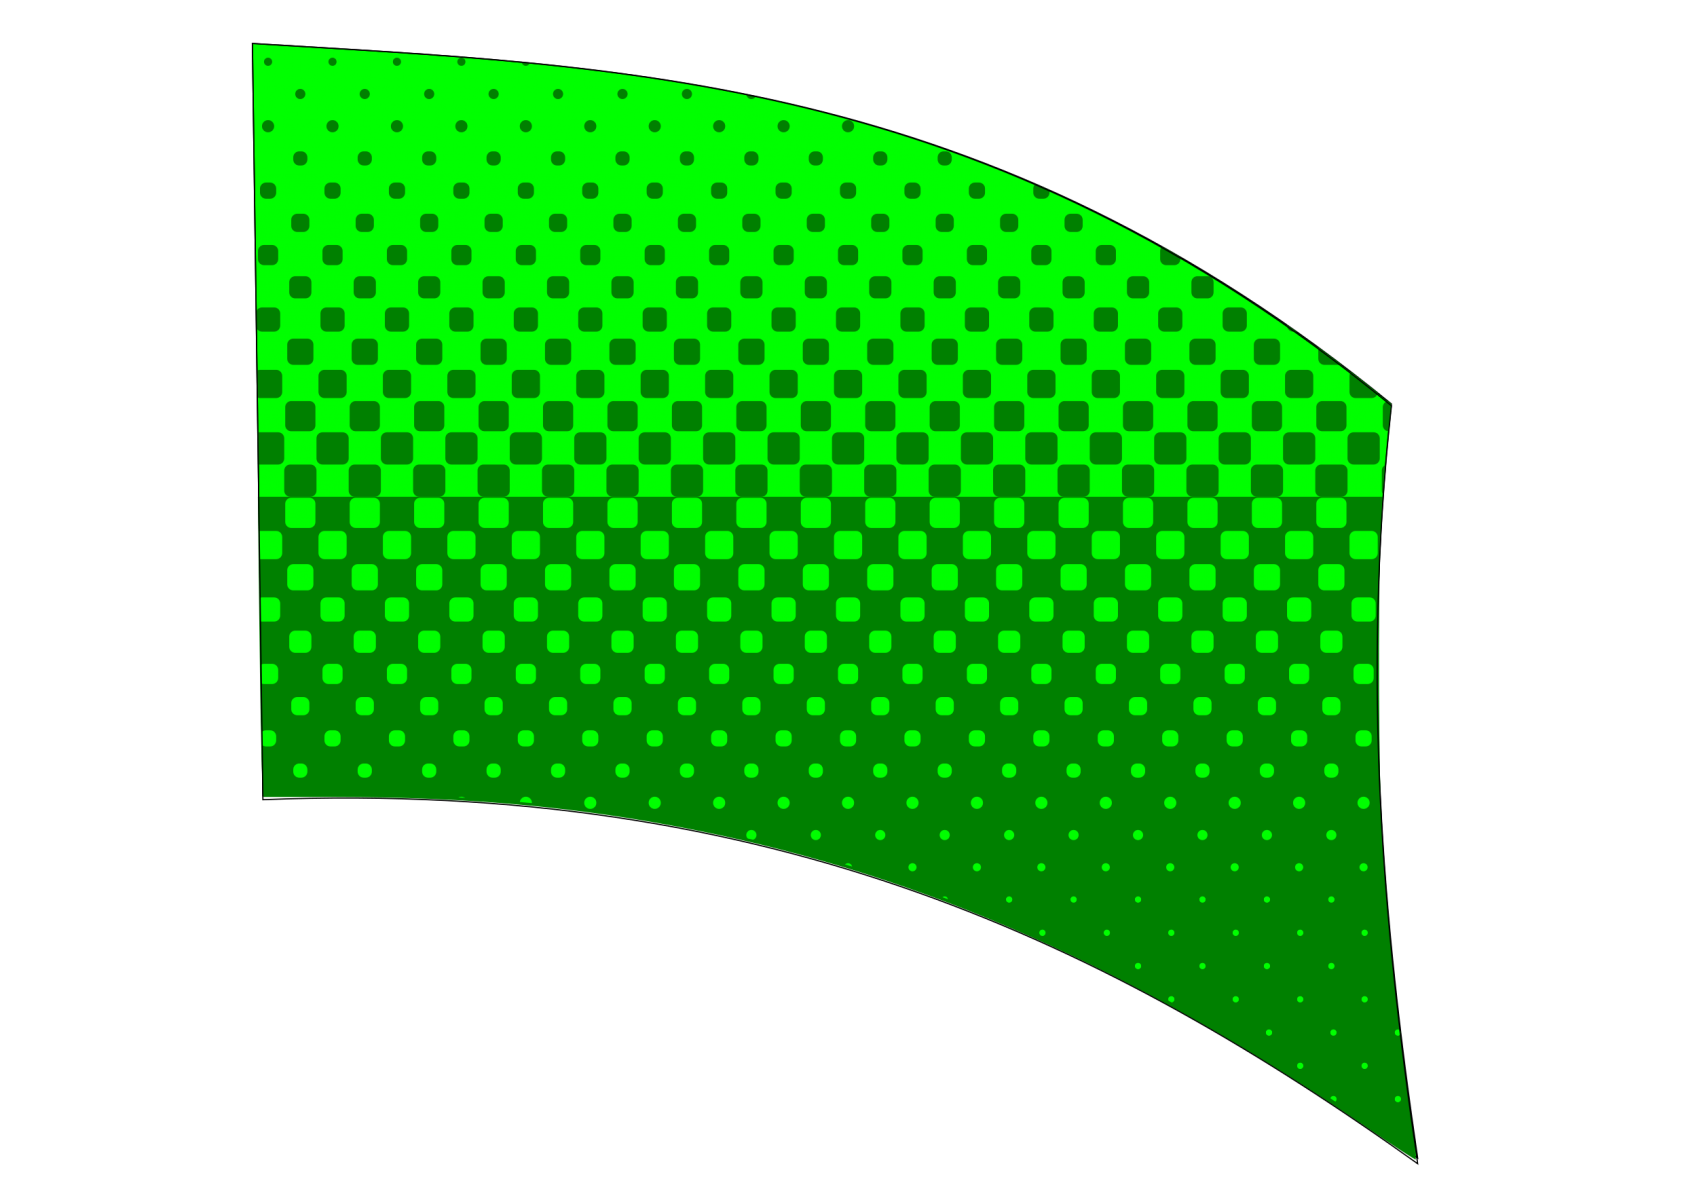 010505s - 36x54 Standard Green Halftone Blend